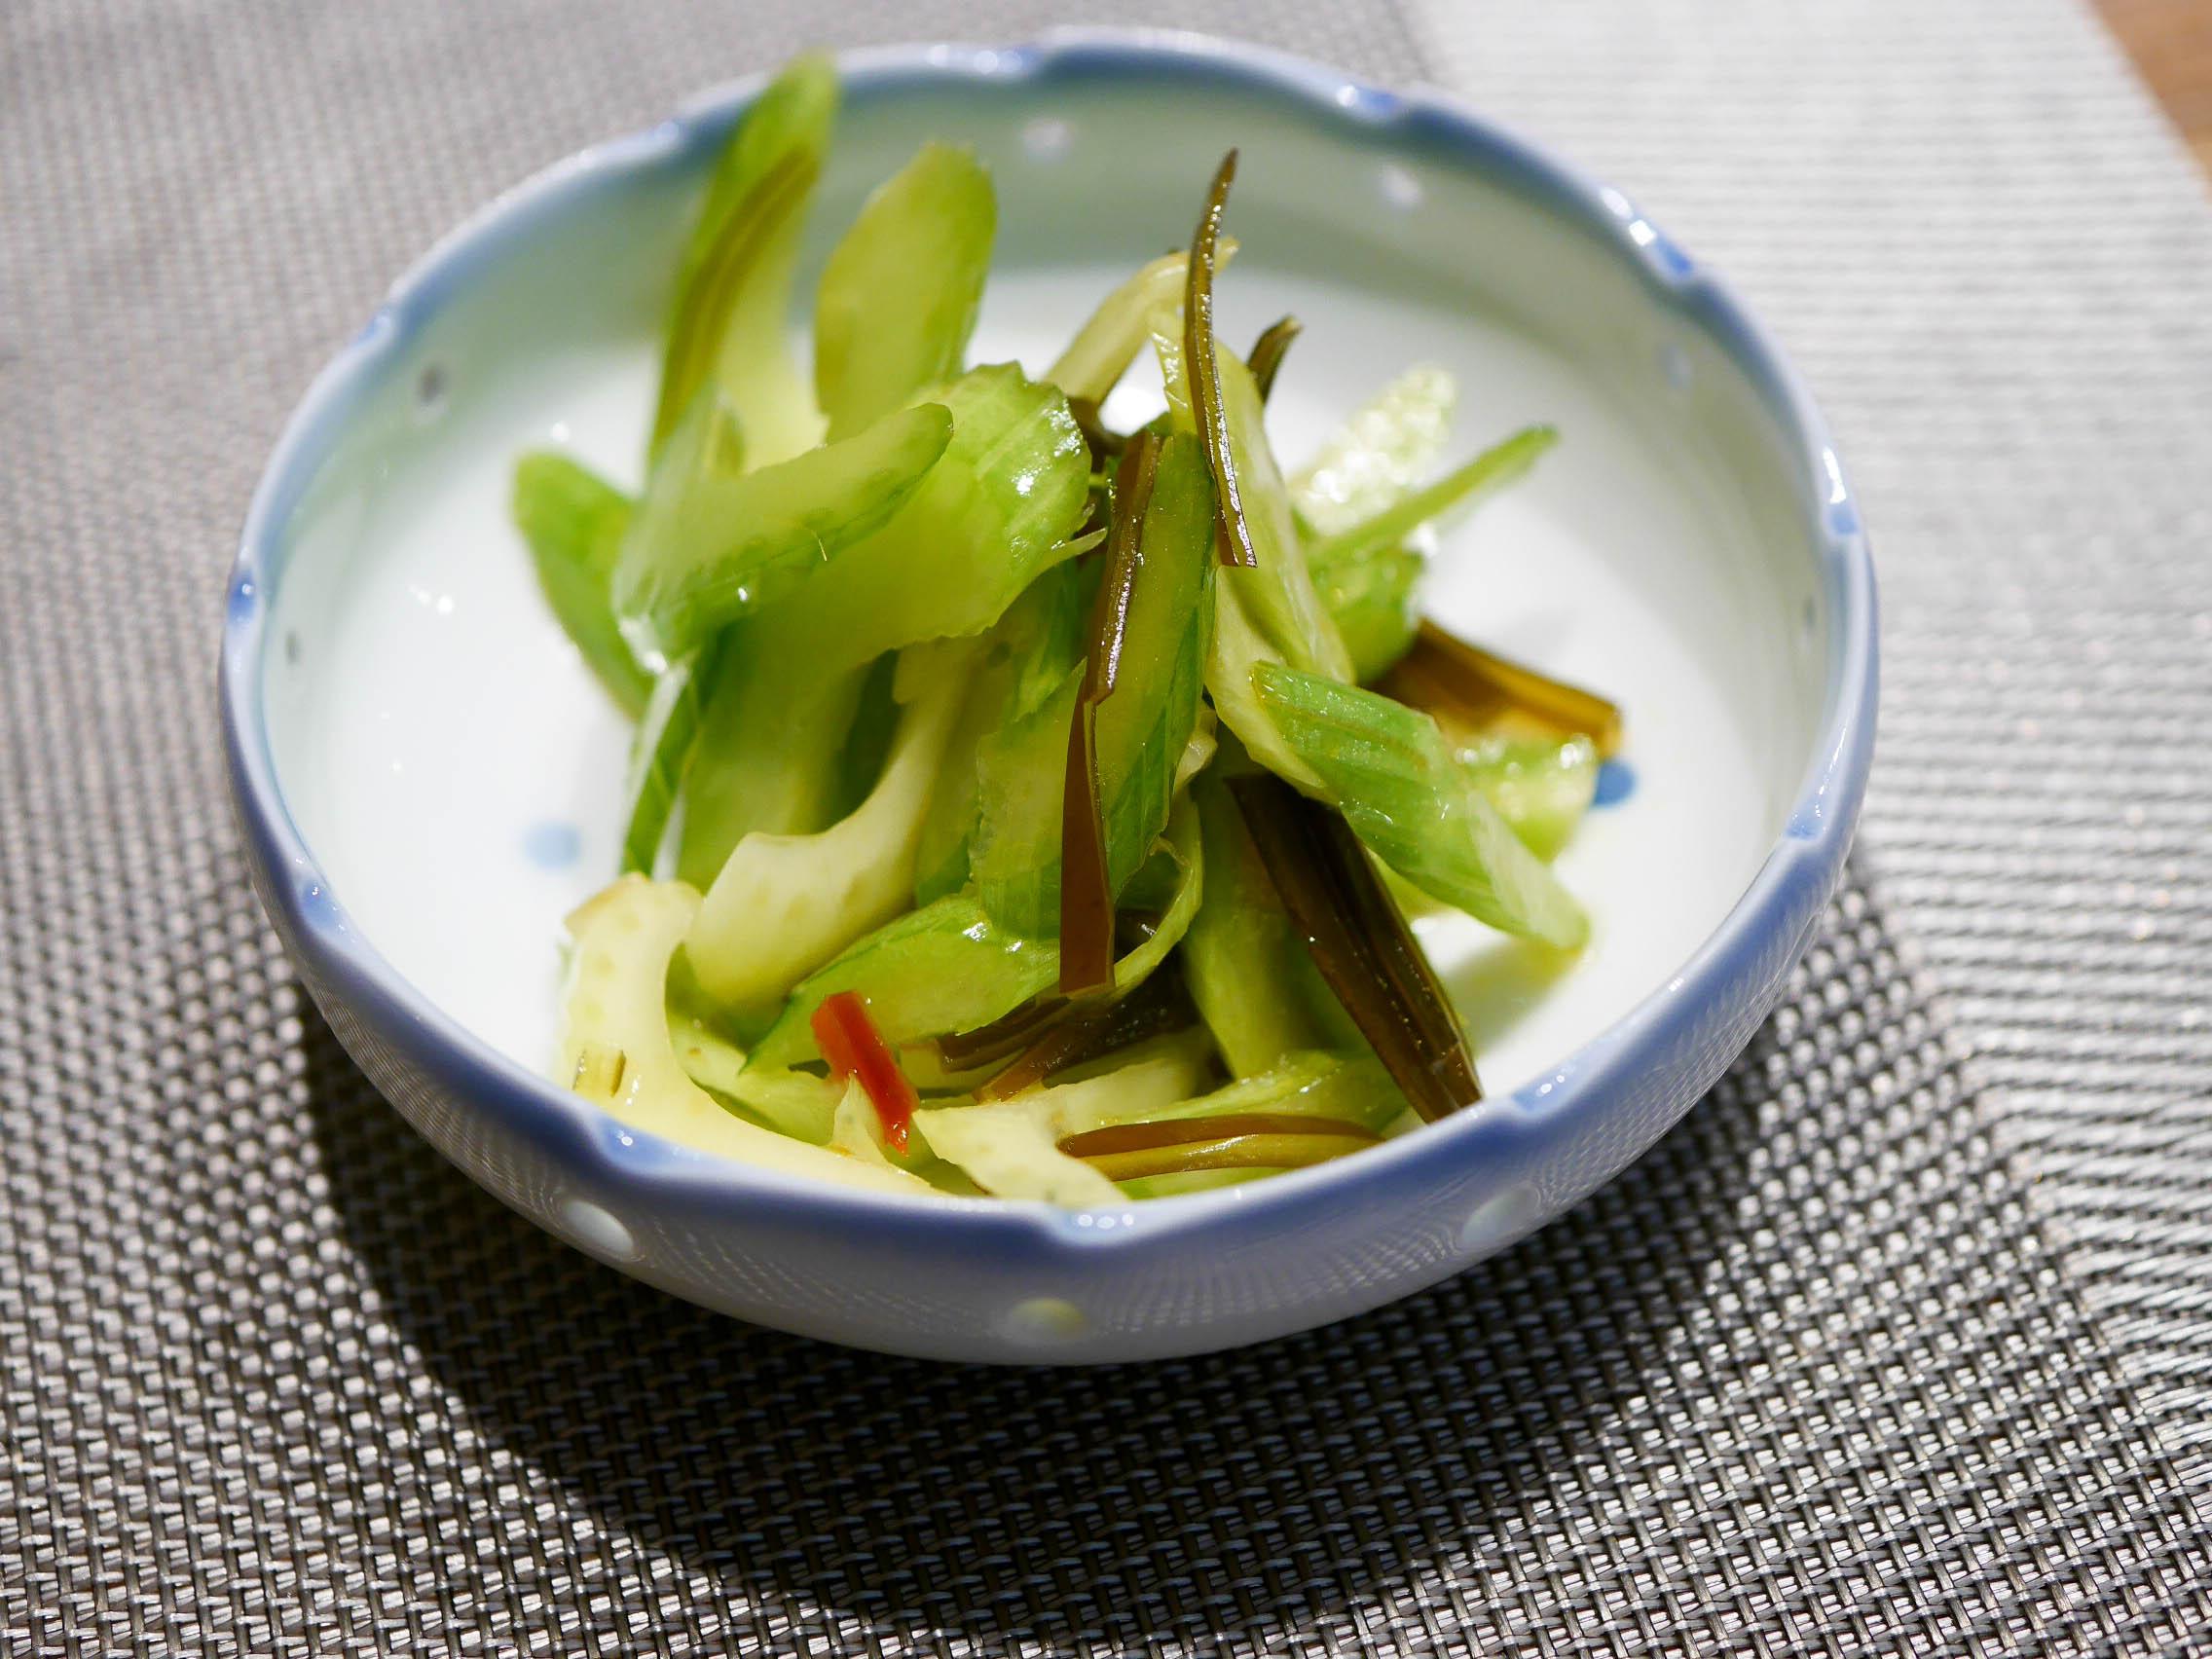 Spicy celery salad